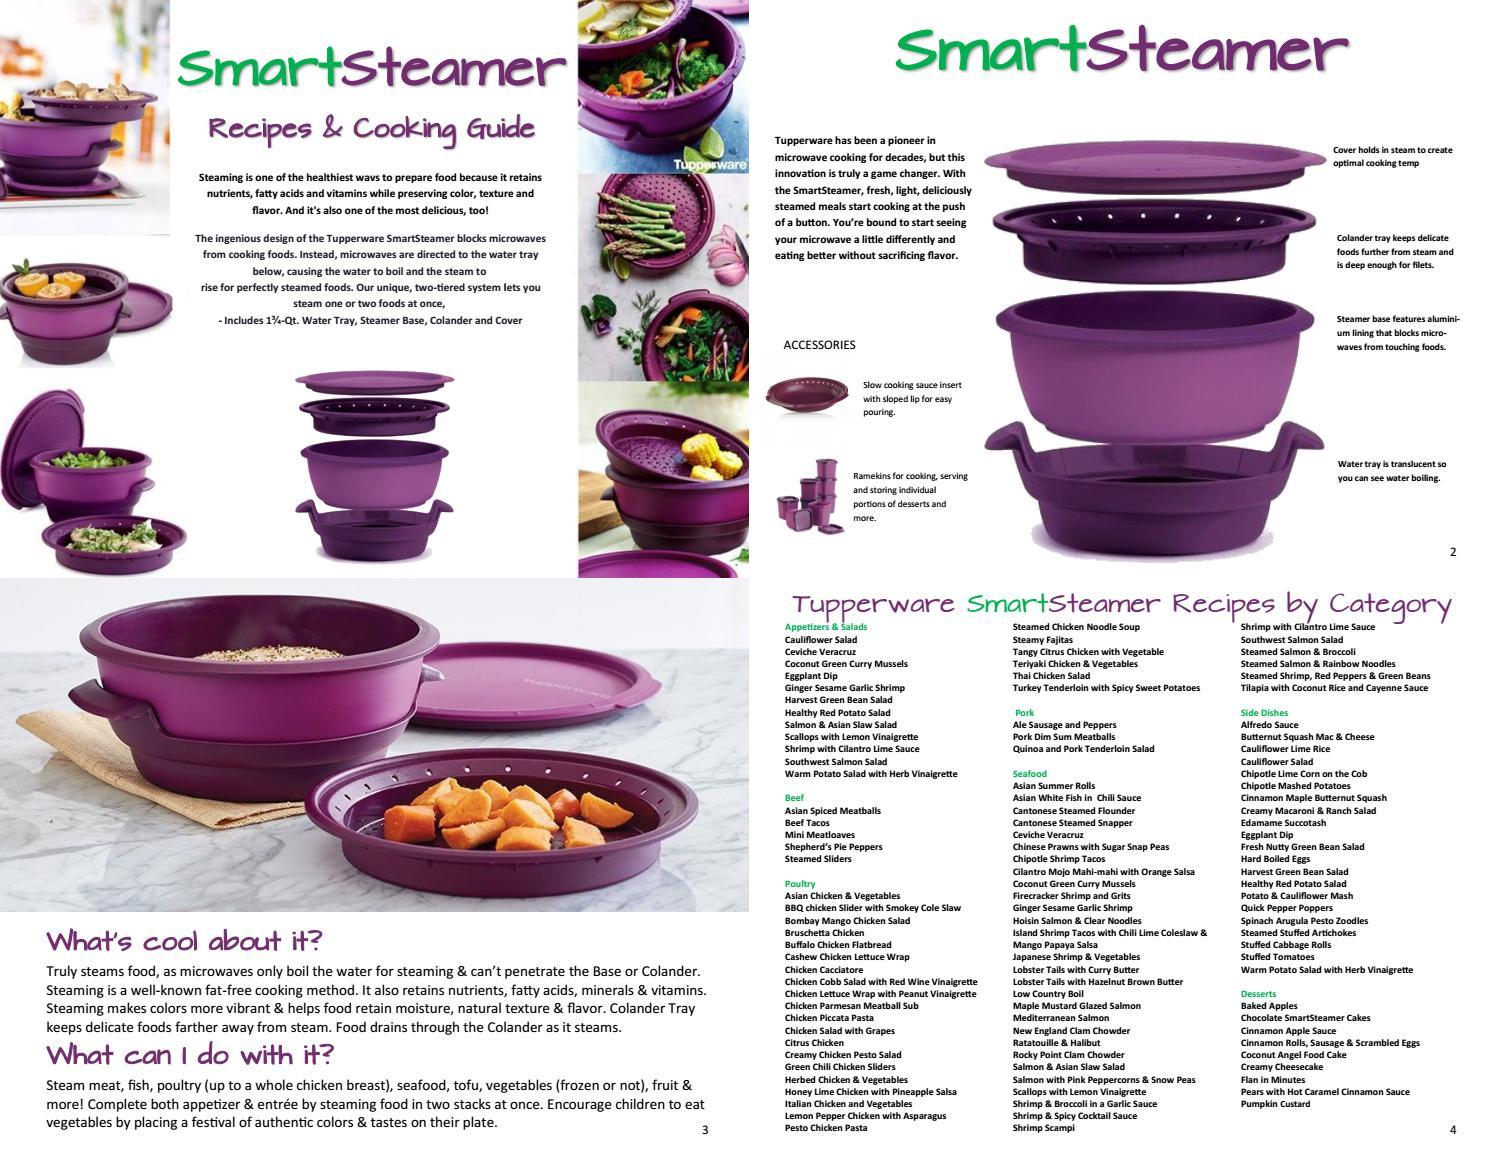 tupperware smartsteamer recipes and